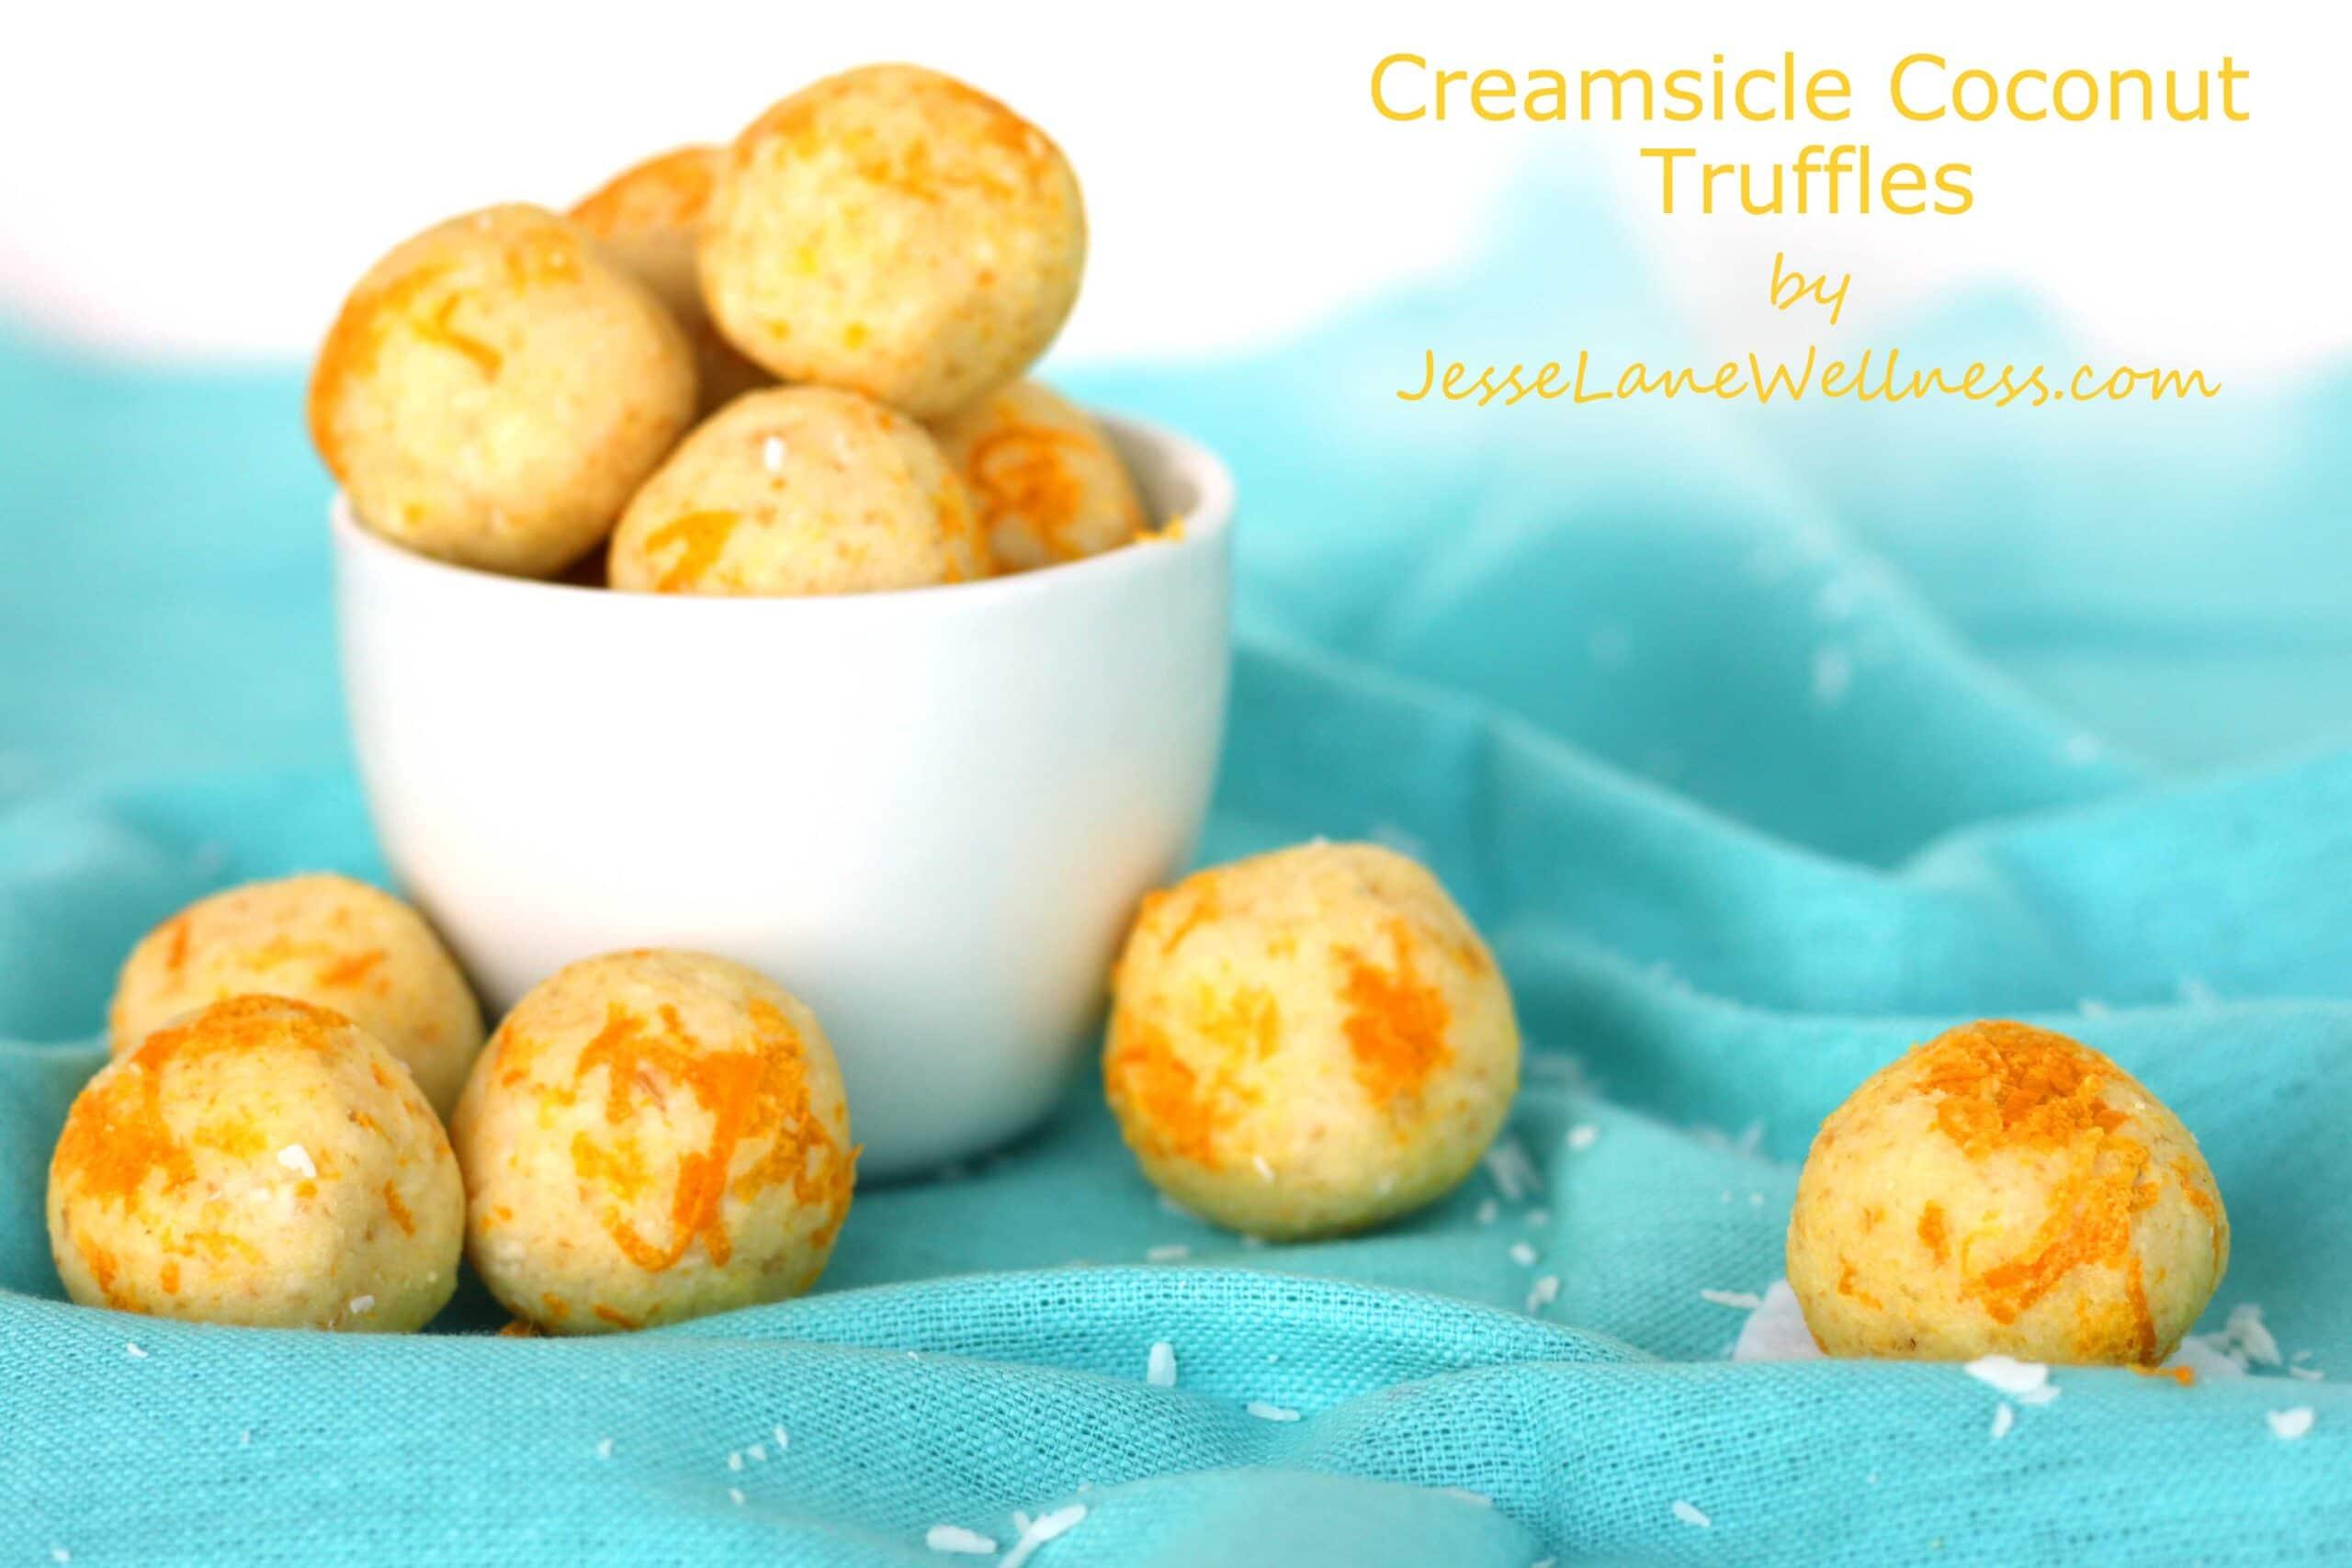 Creamsicle Coconut Truffles by @jesselwellness #coconut #truffles